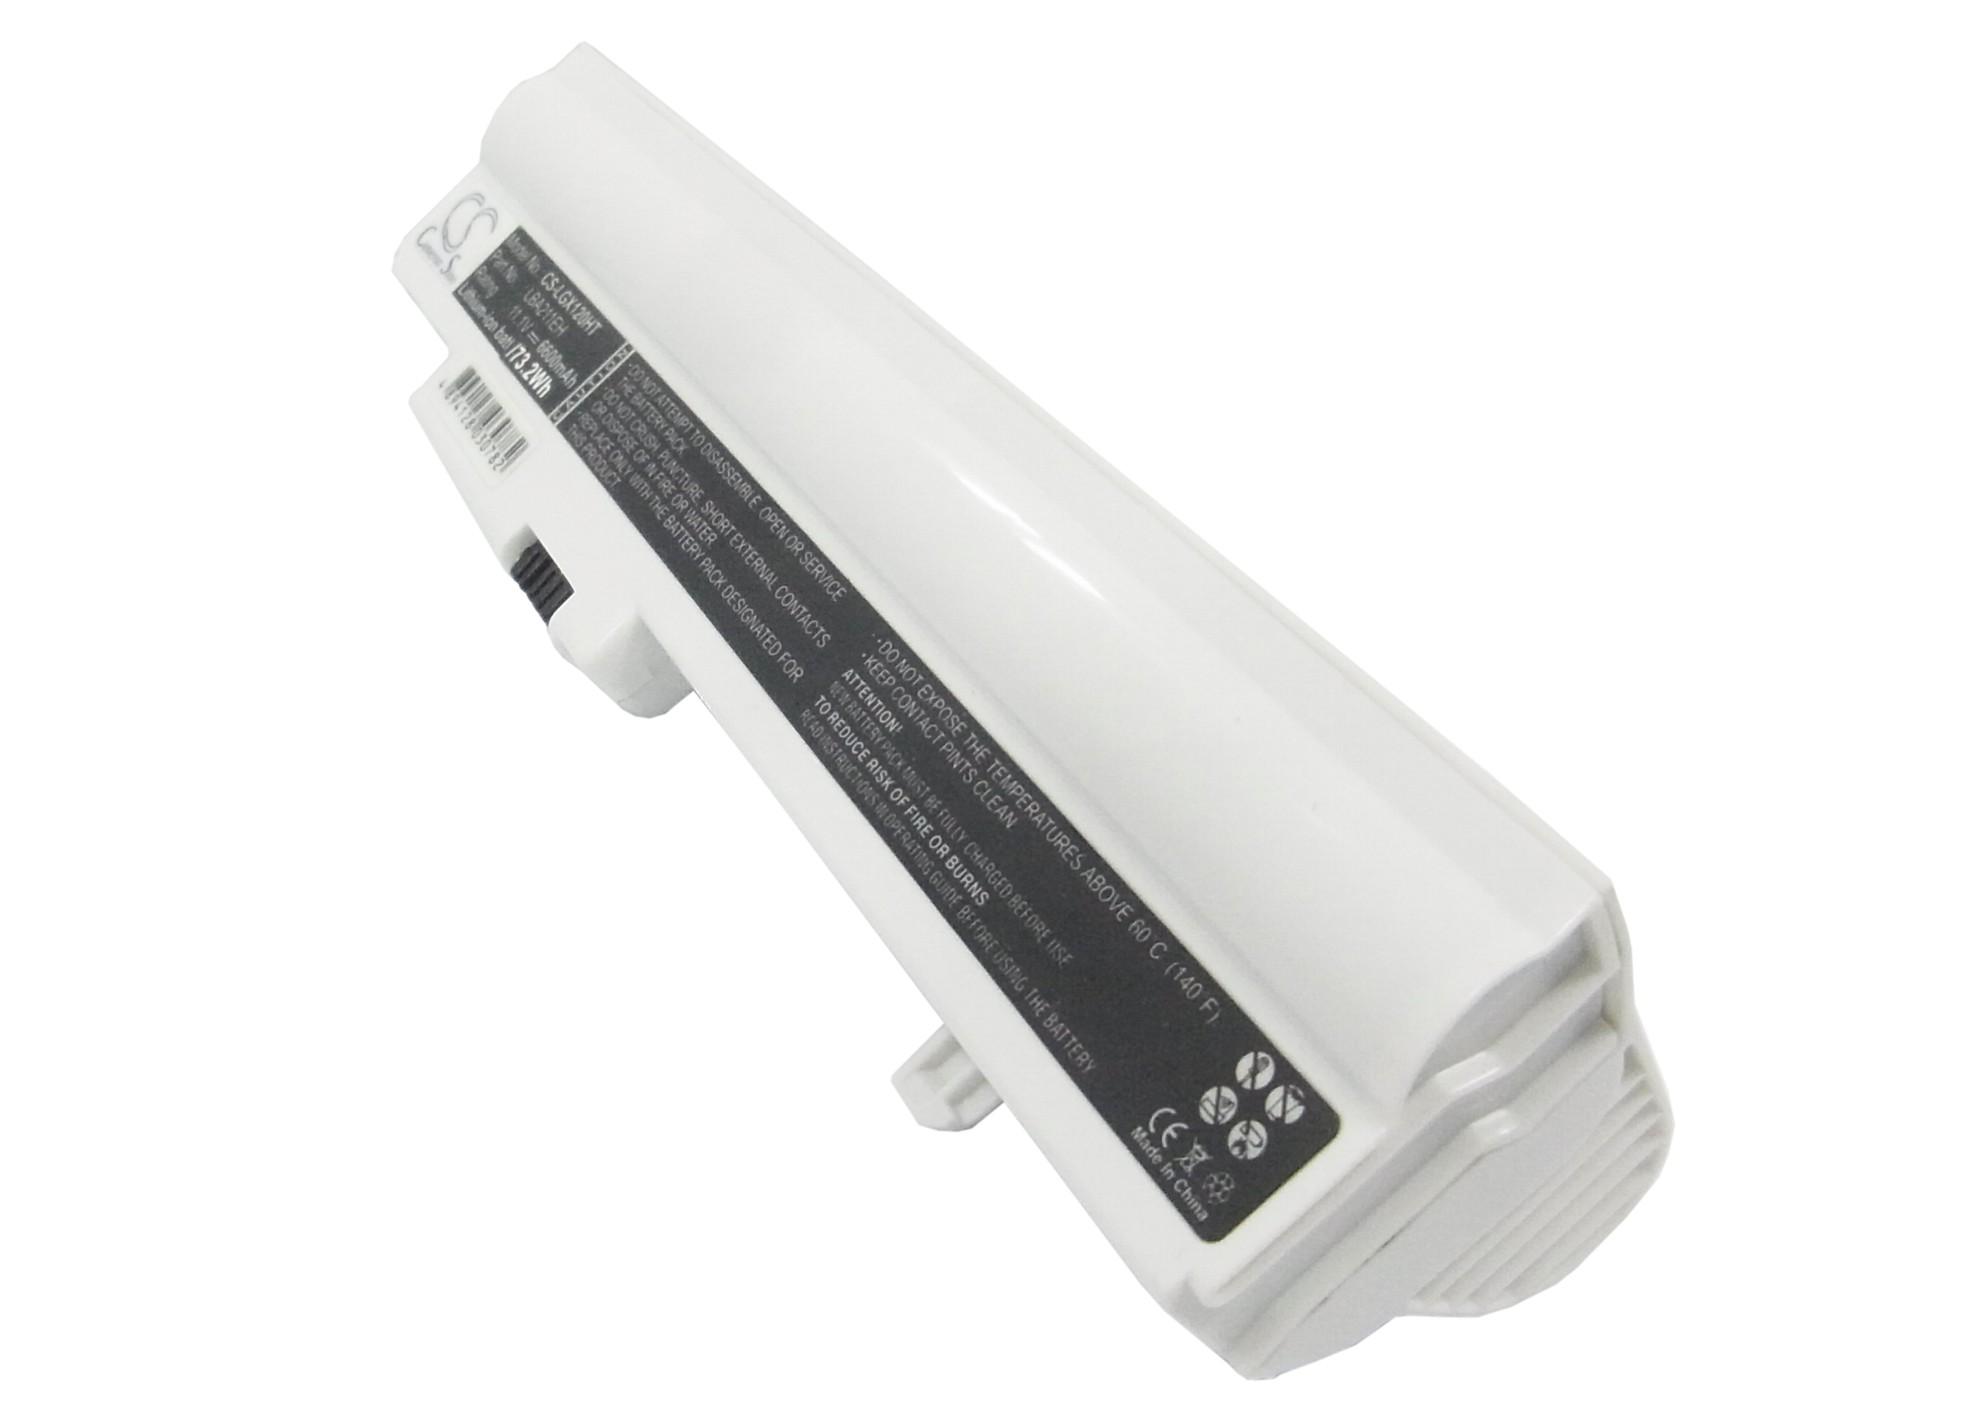 Cameron Sino baterie do netbooků pro LG X120-L.C7B1A9 11.1V Li-ion 6600mAh bílá - neoriginální